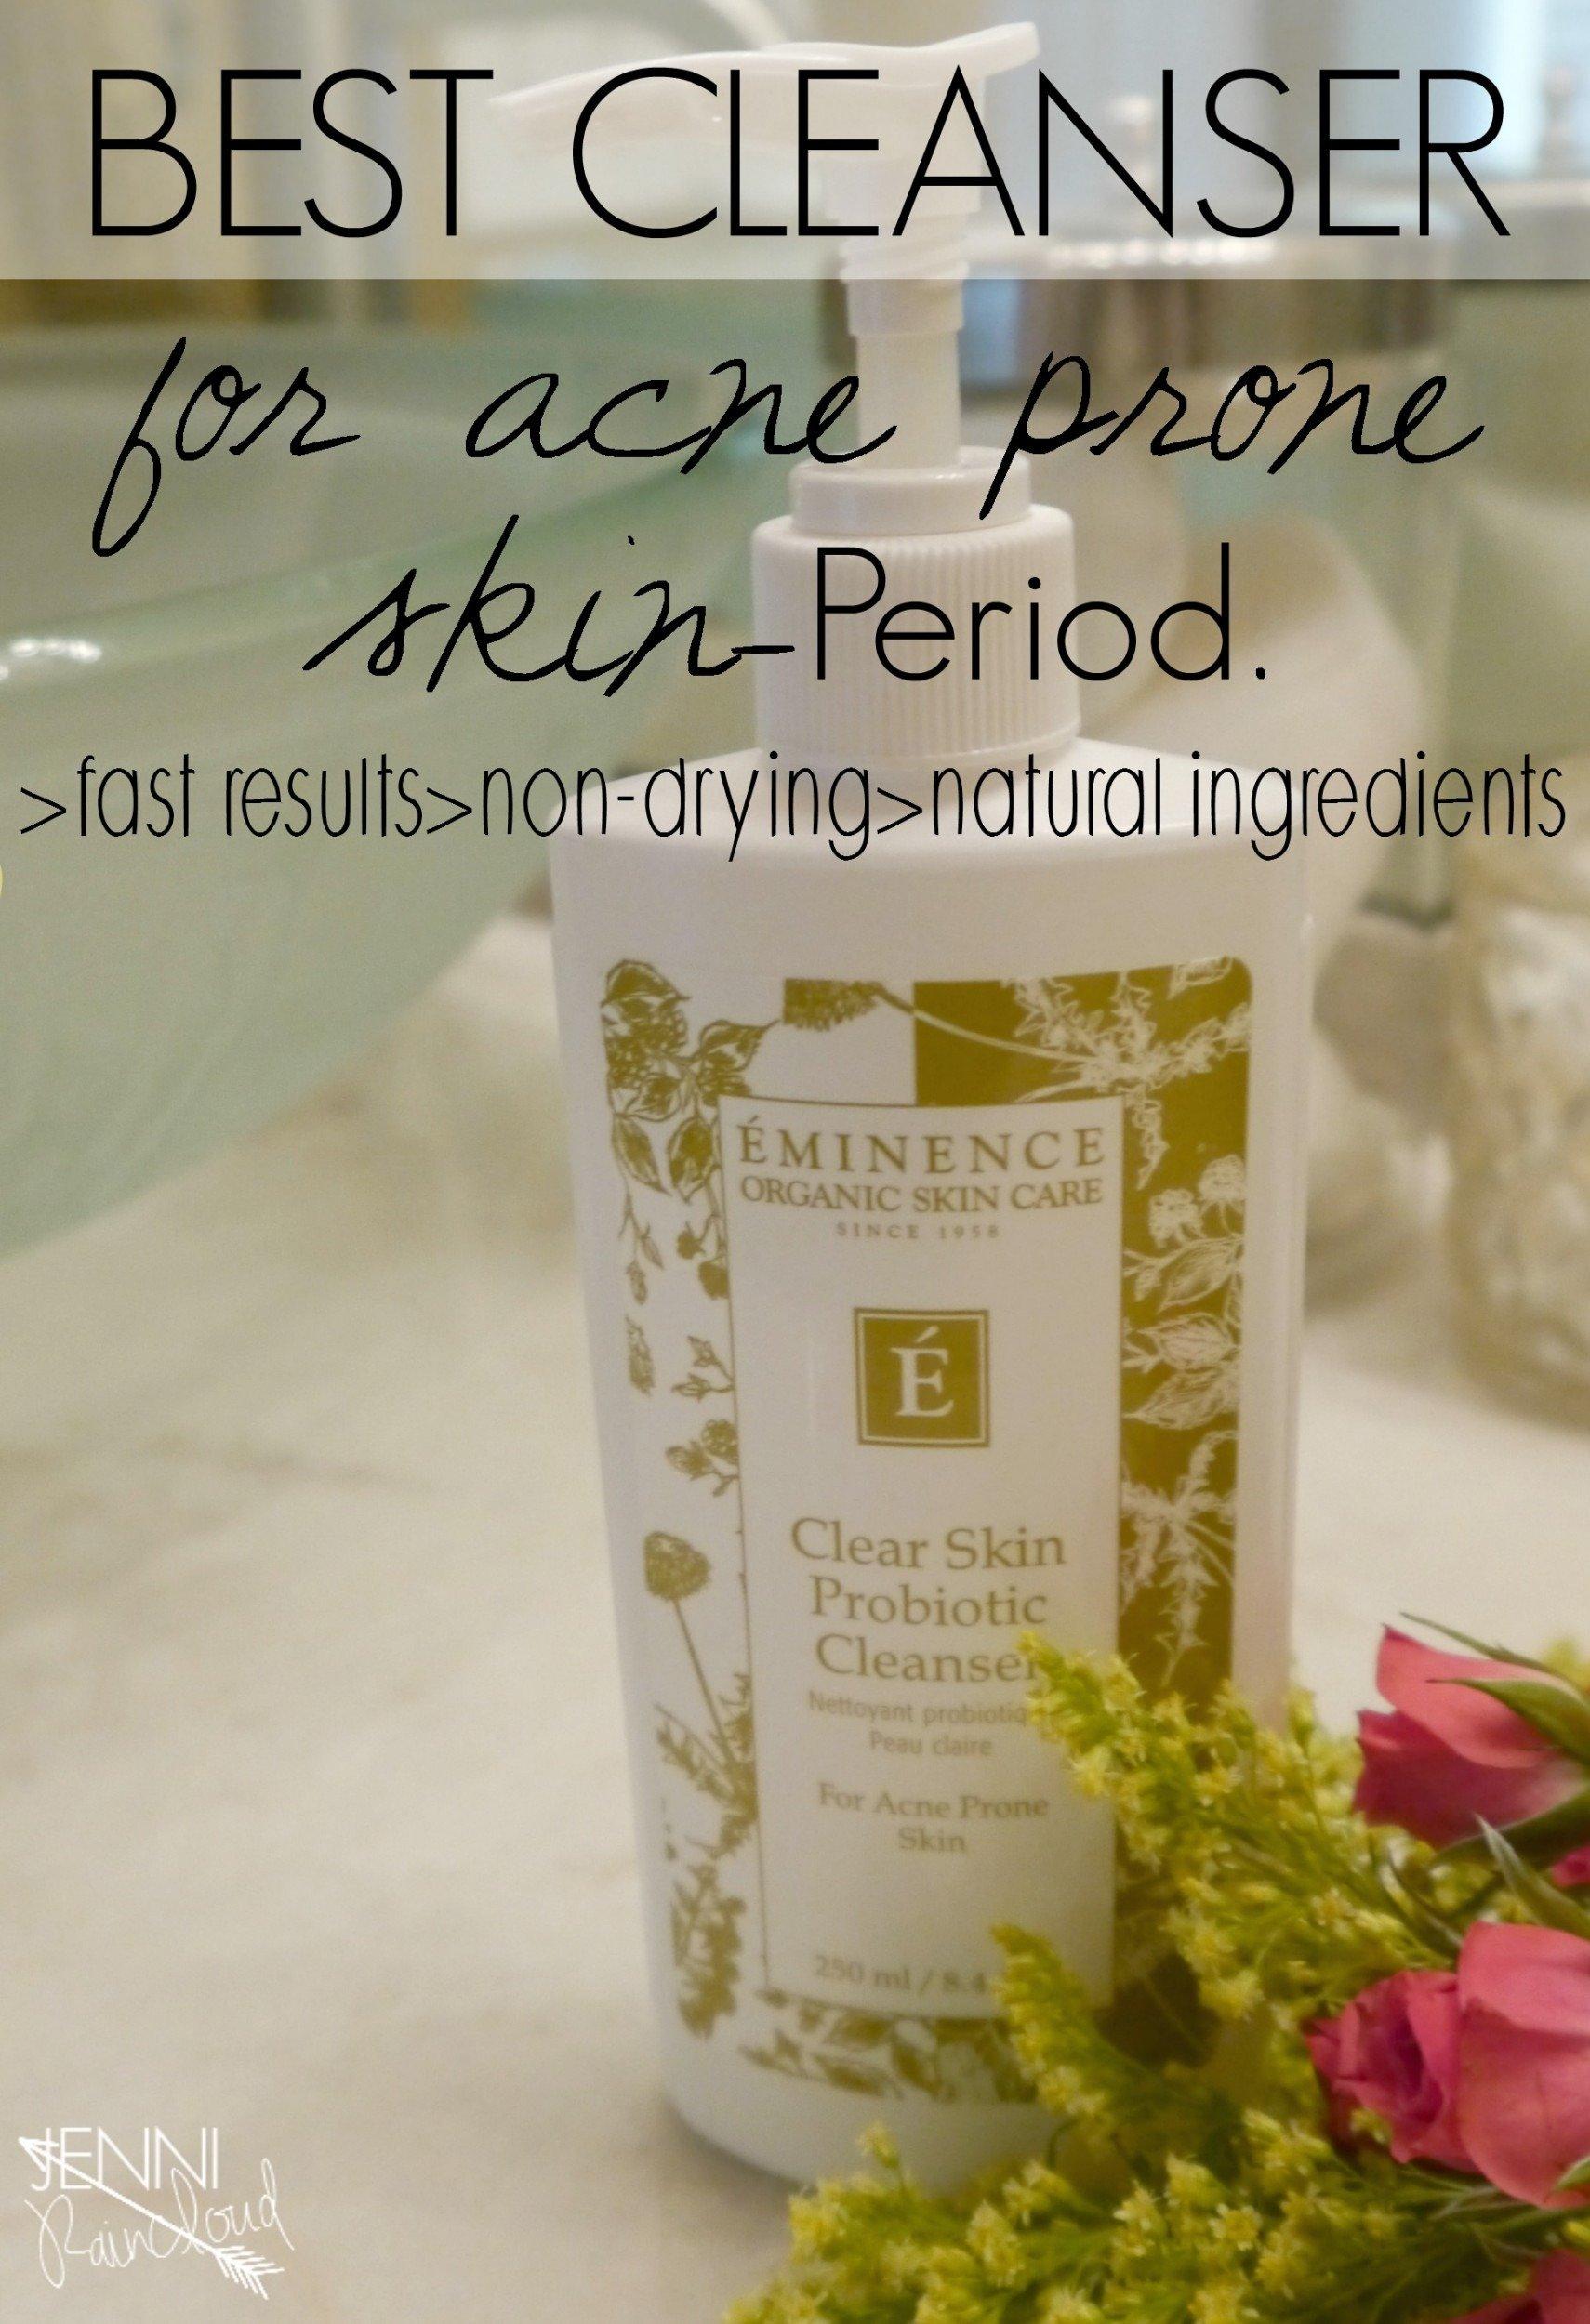 Eminence Probiotic Cleanser